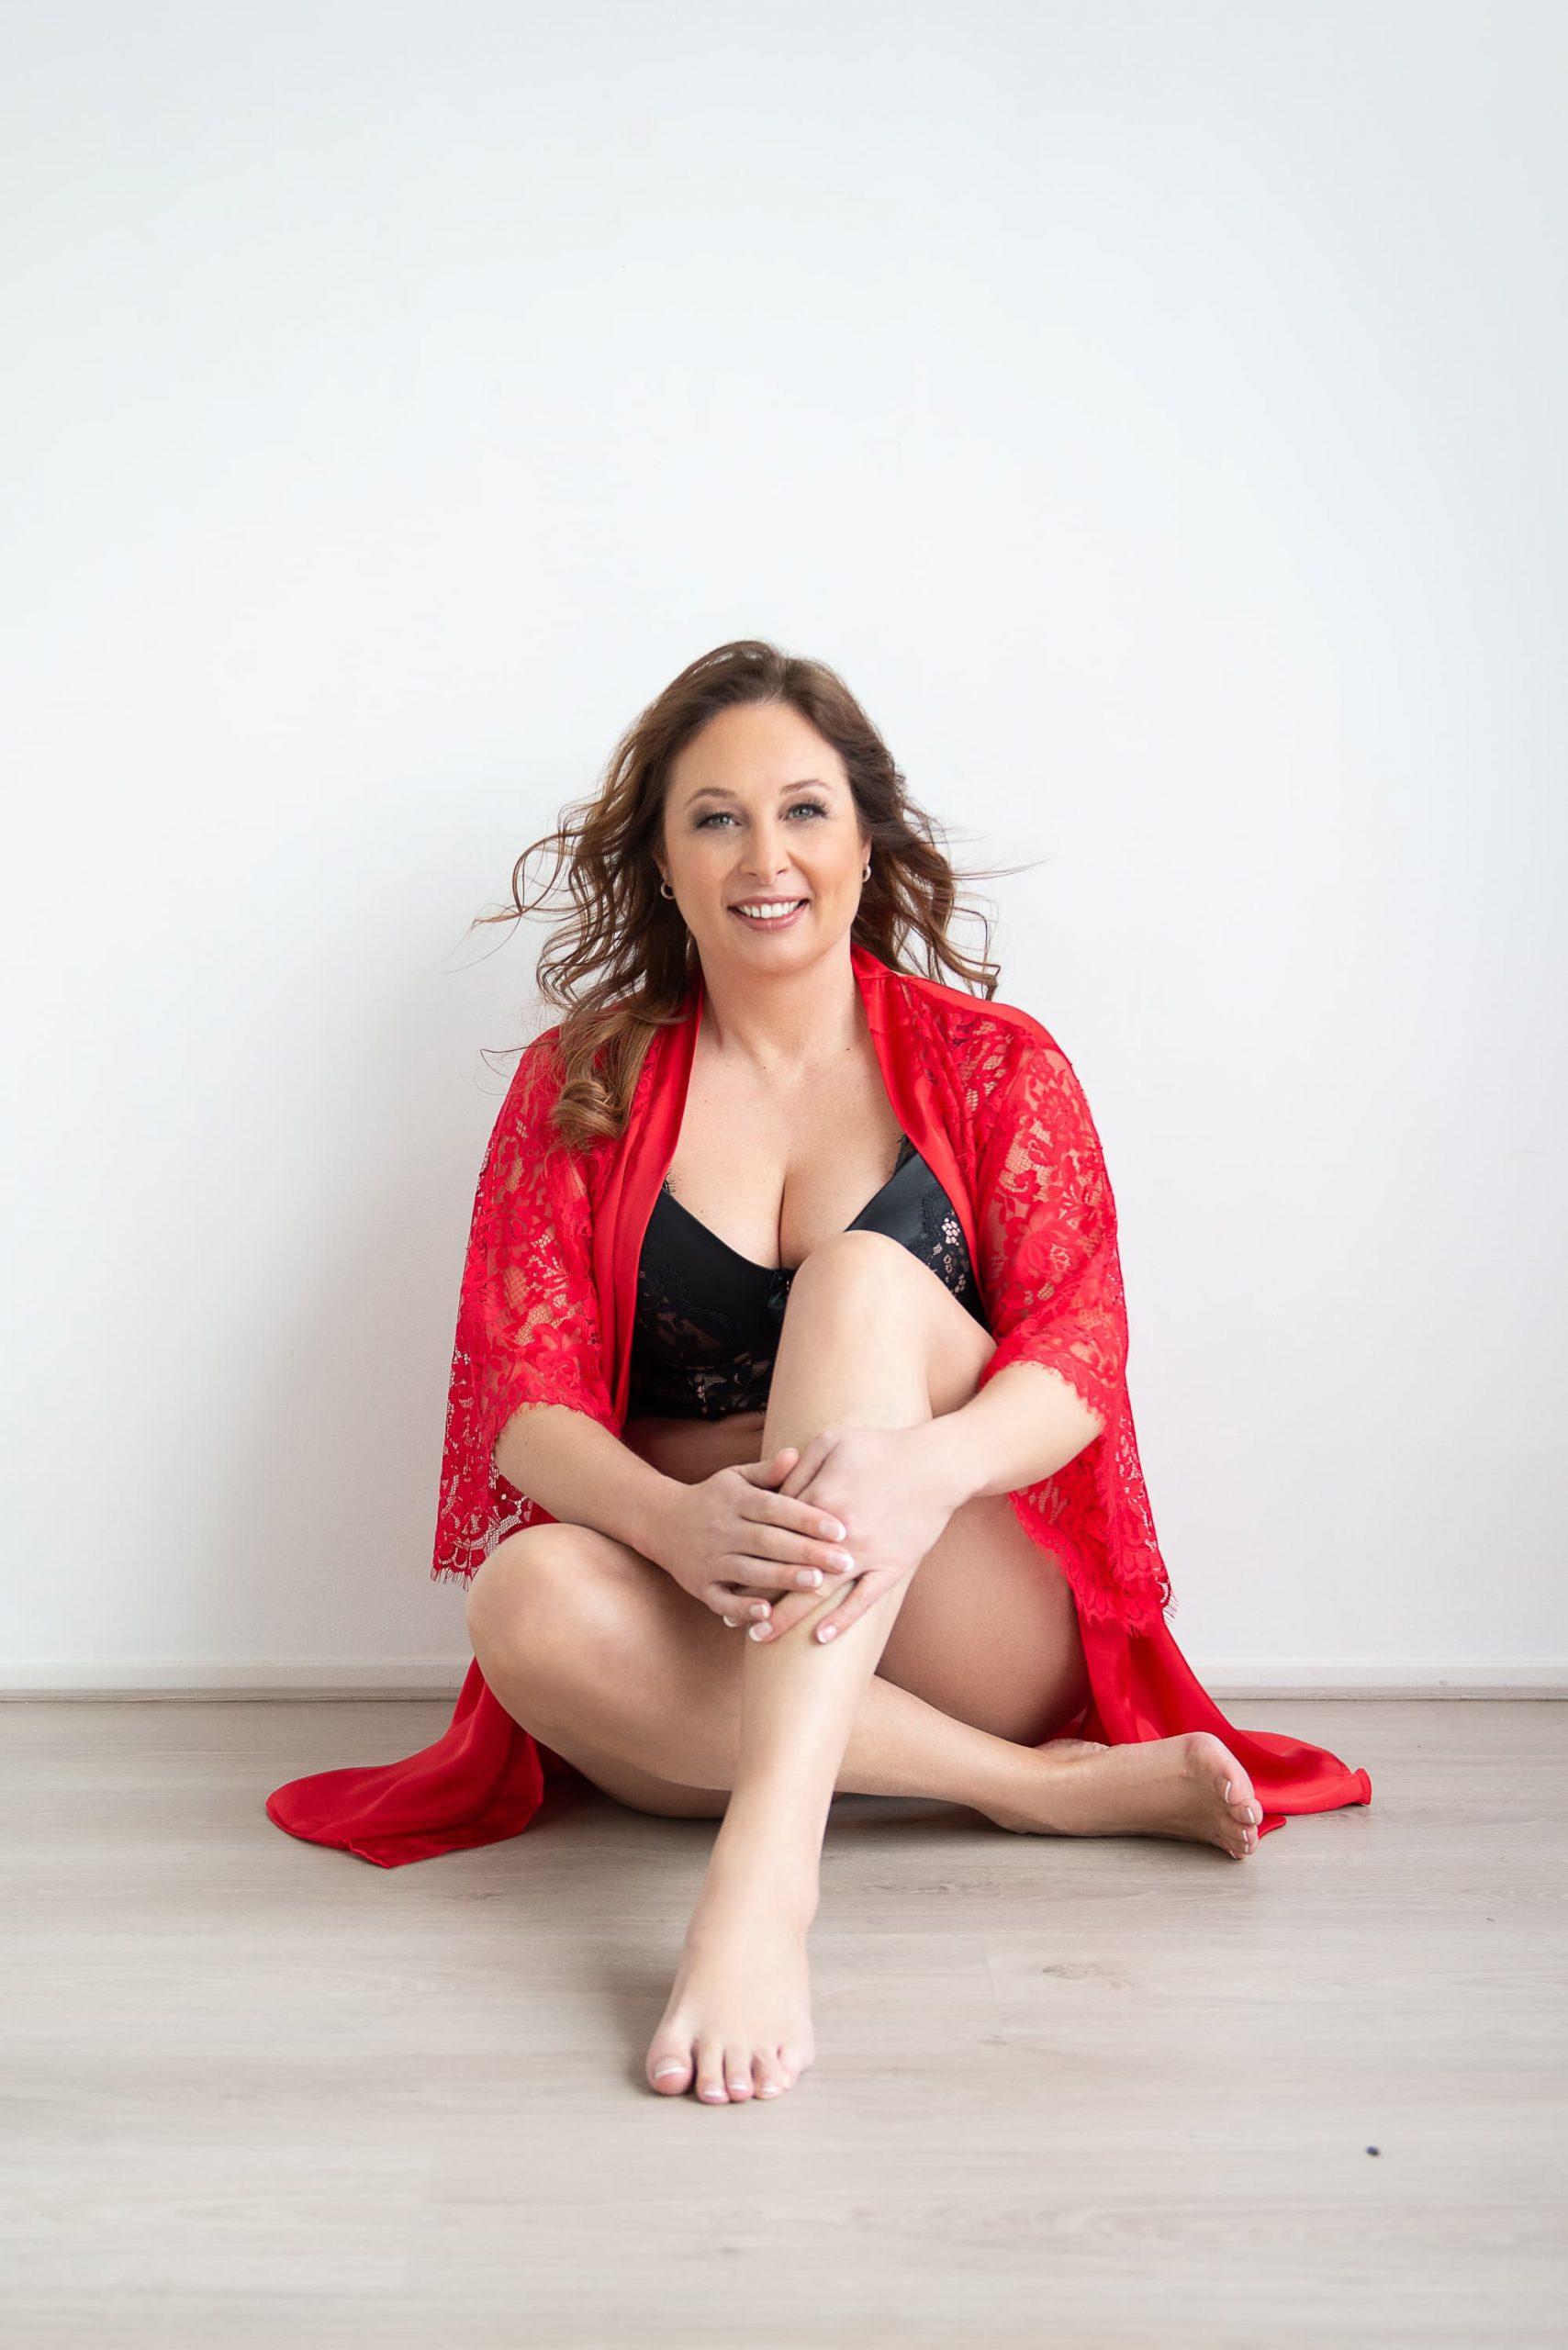 vrouw in rode peignoir